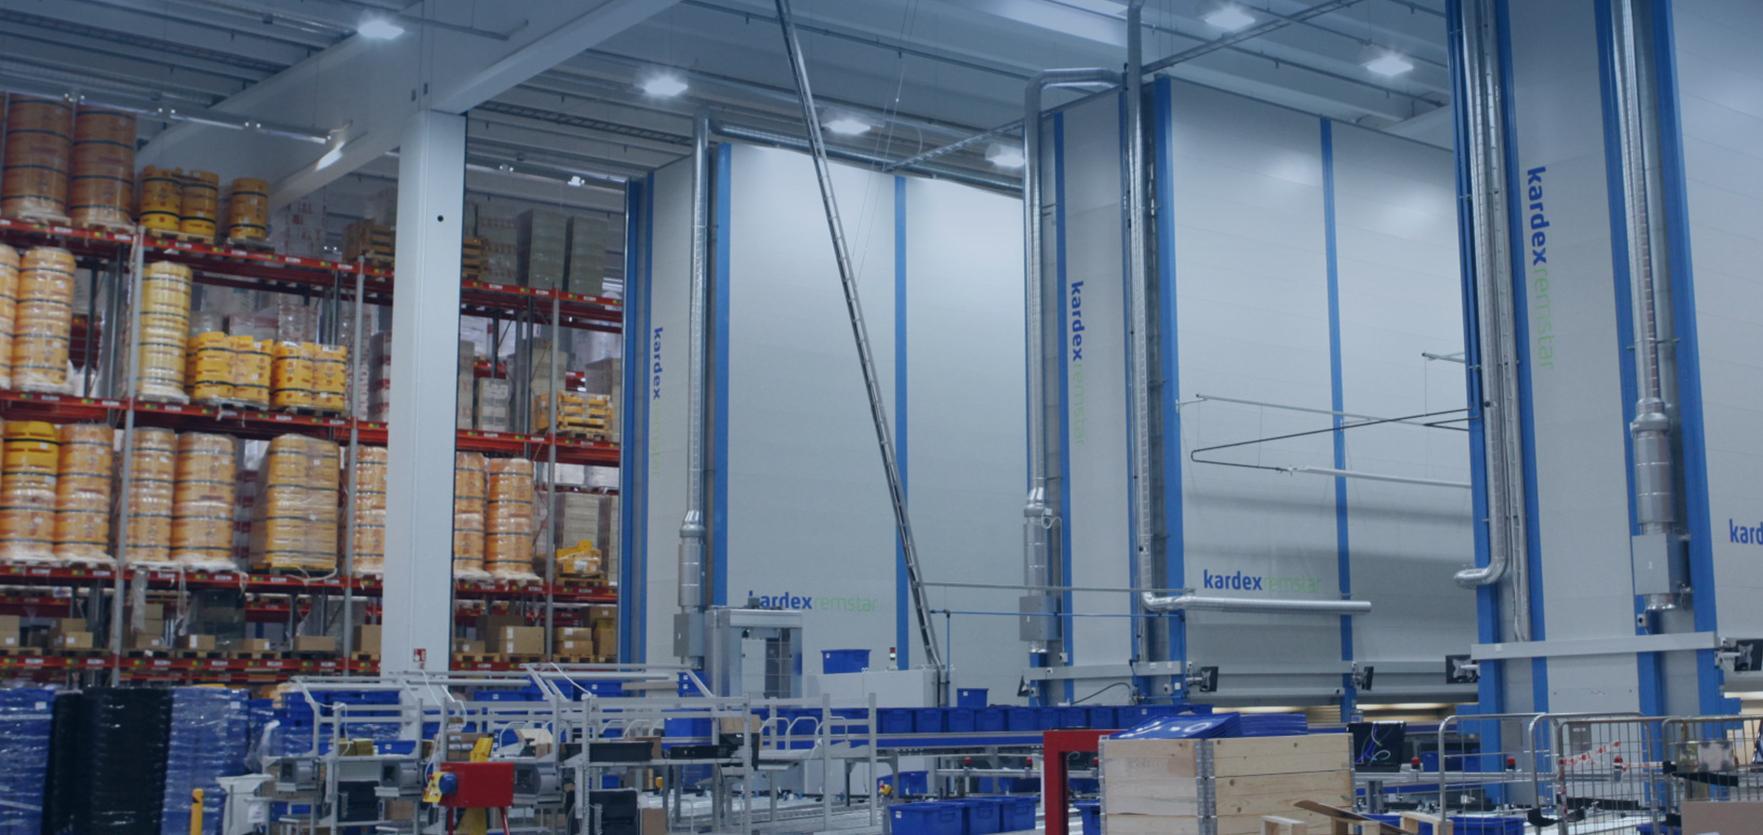 ETRA Megacenter sai PolarProlta apua lisätyövoiman tarpeeseen